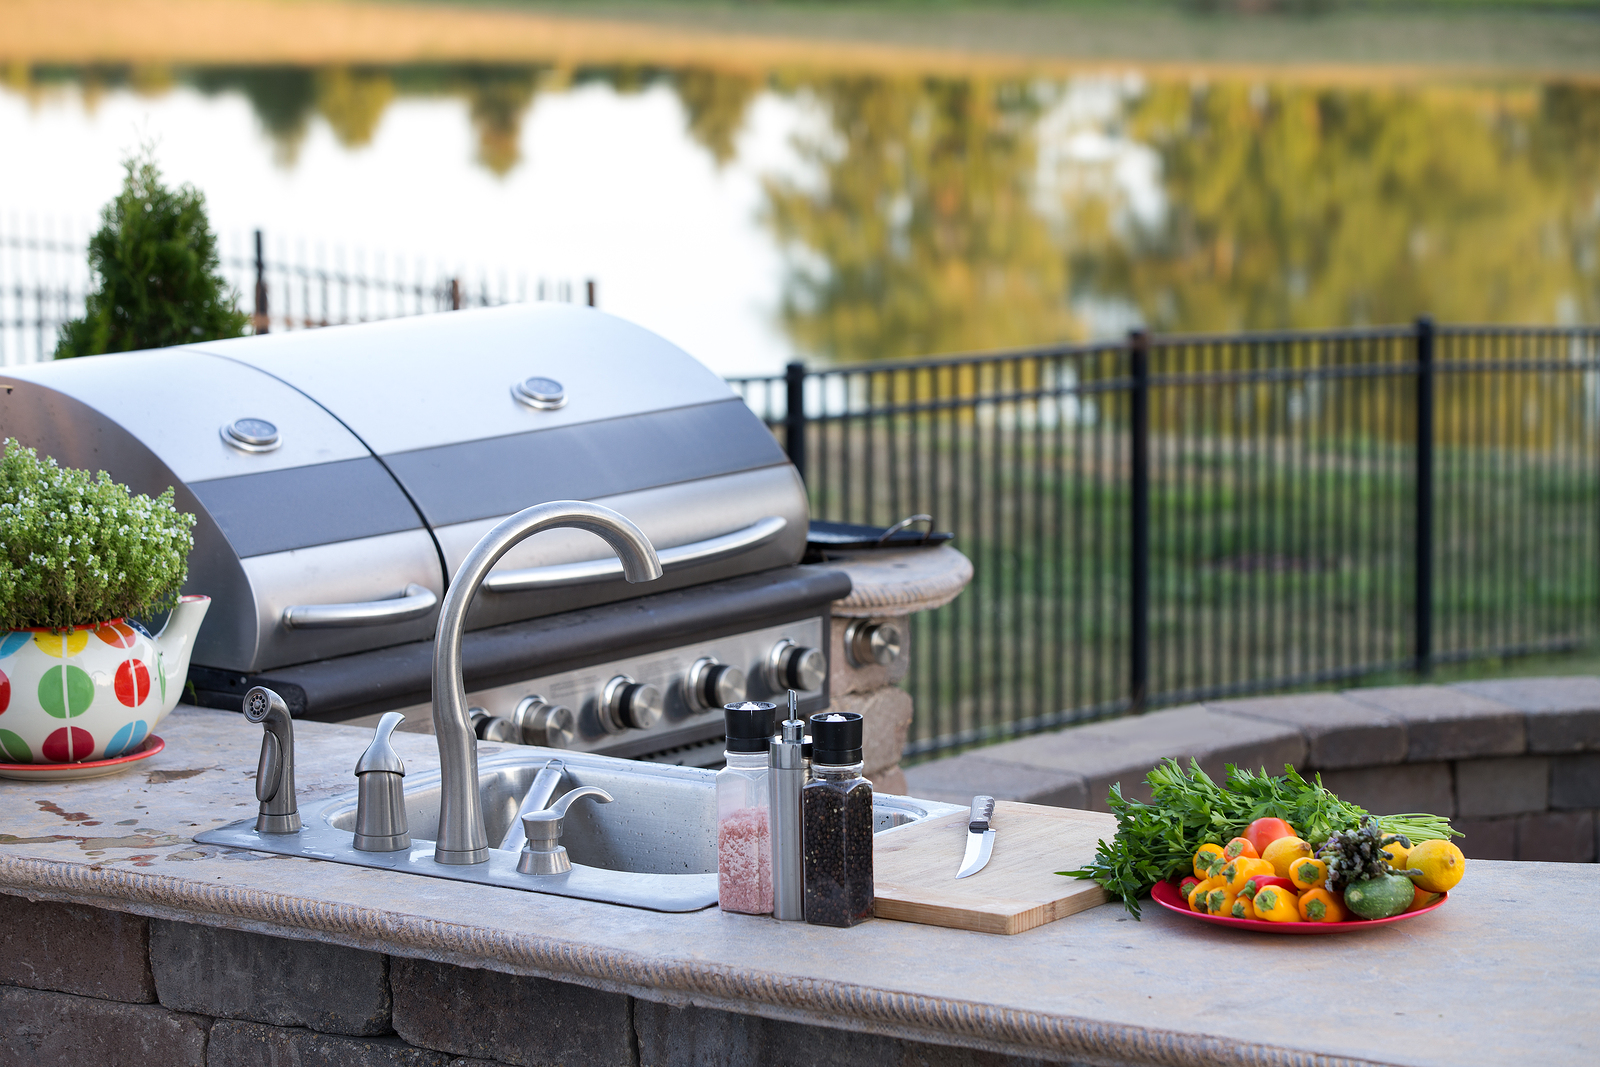 bigstock-Preparing-A-Healthy-Meal-In-An-86356463.jpg